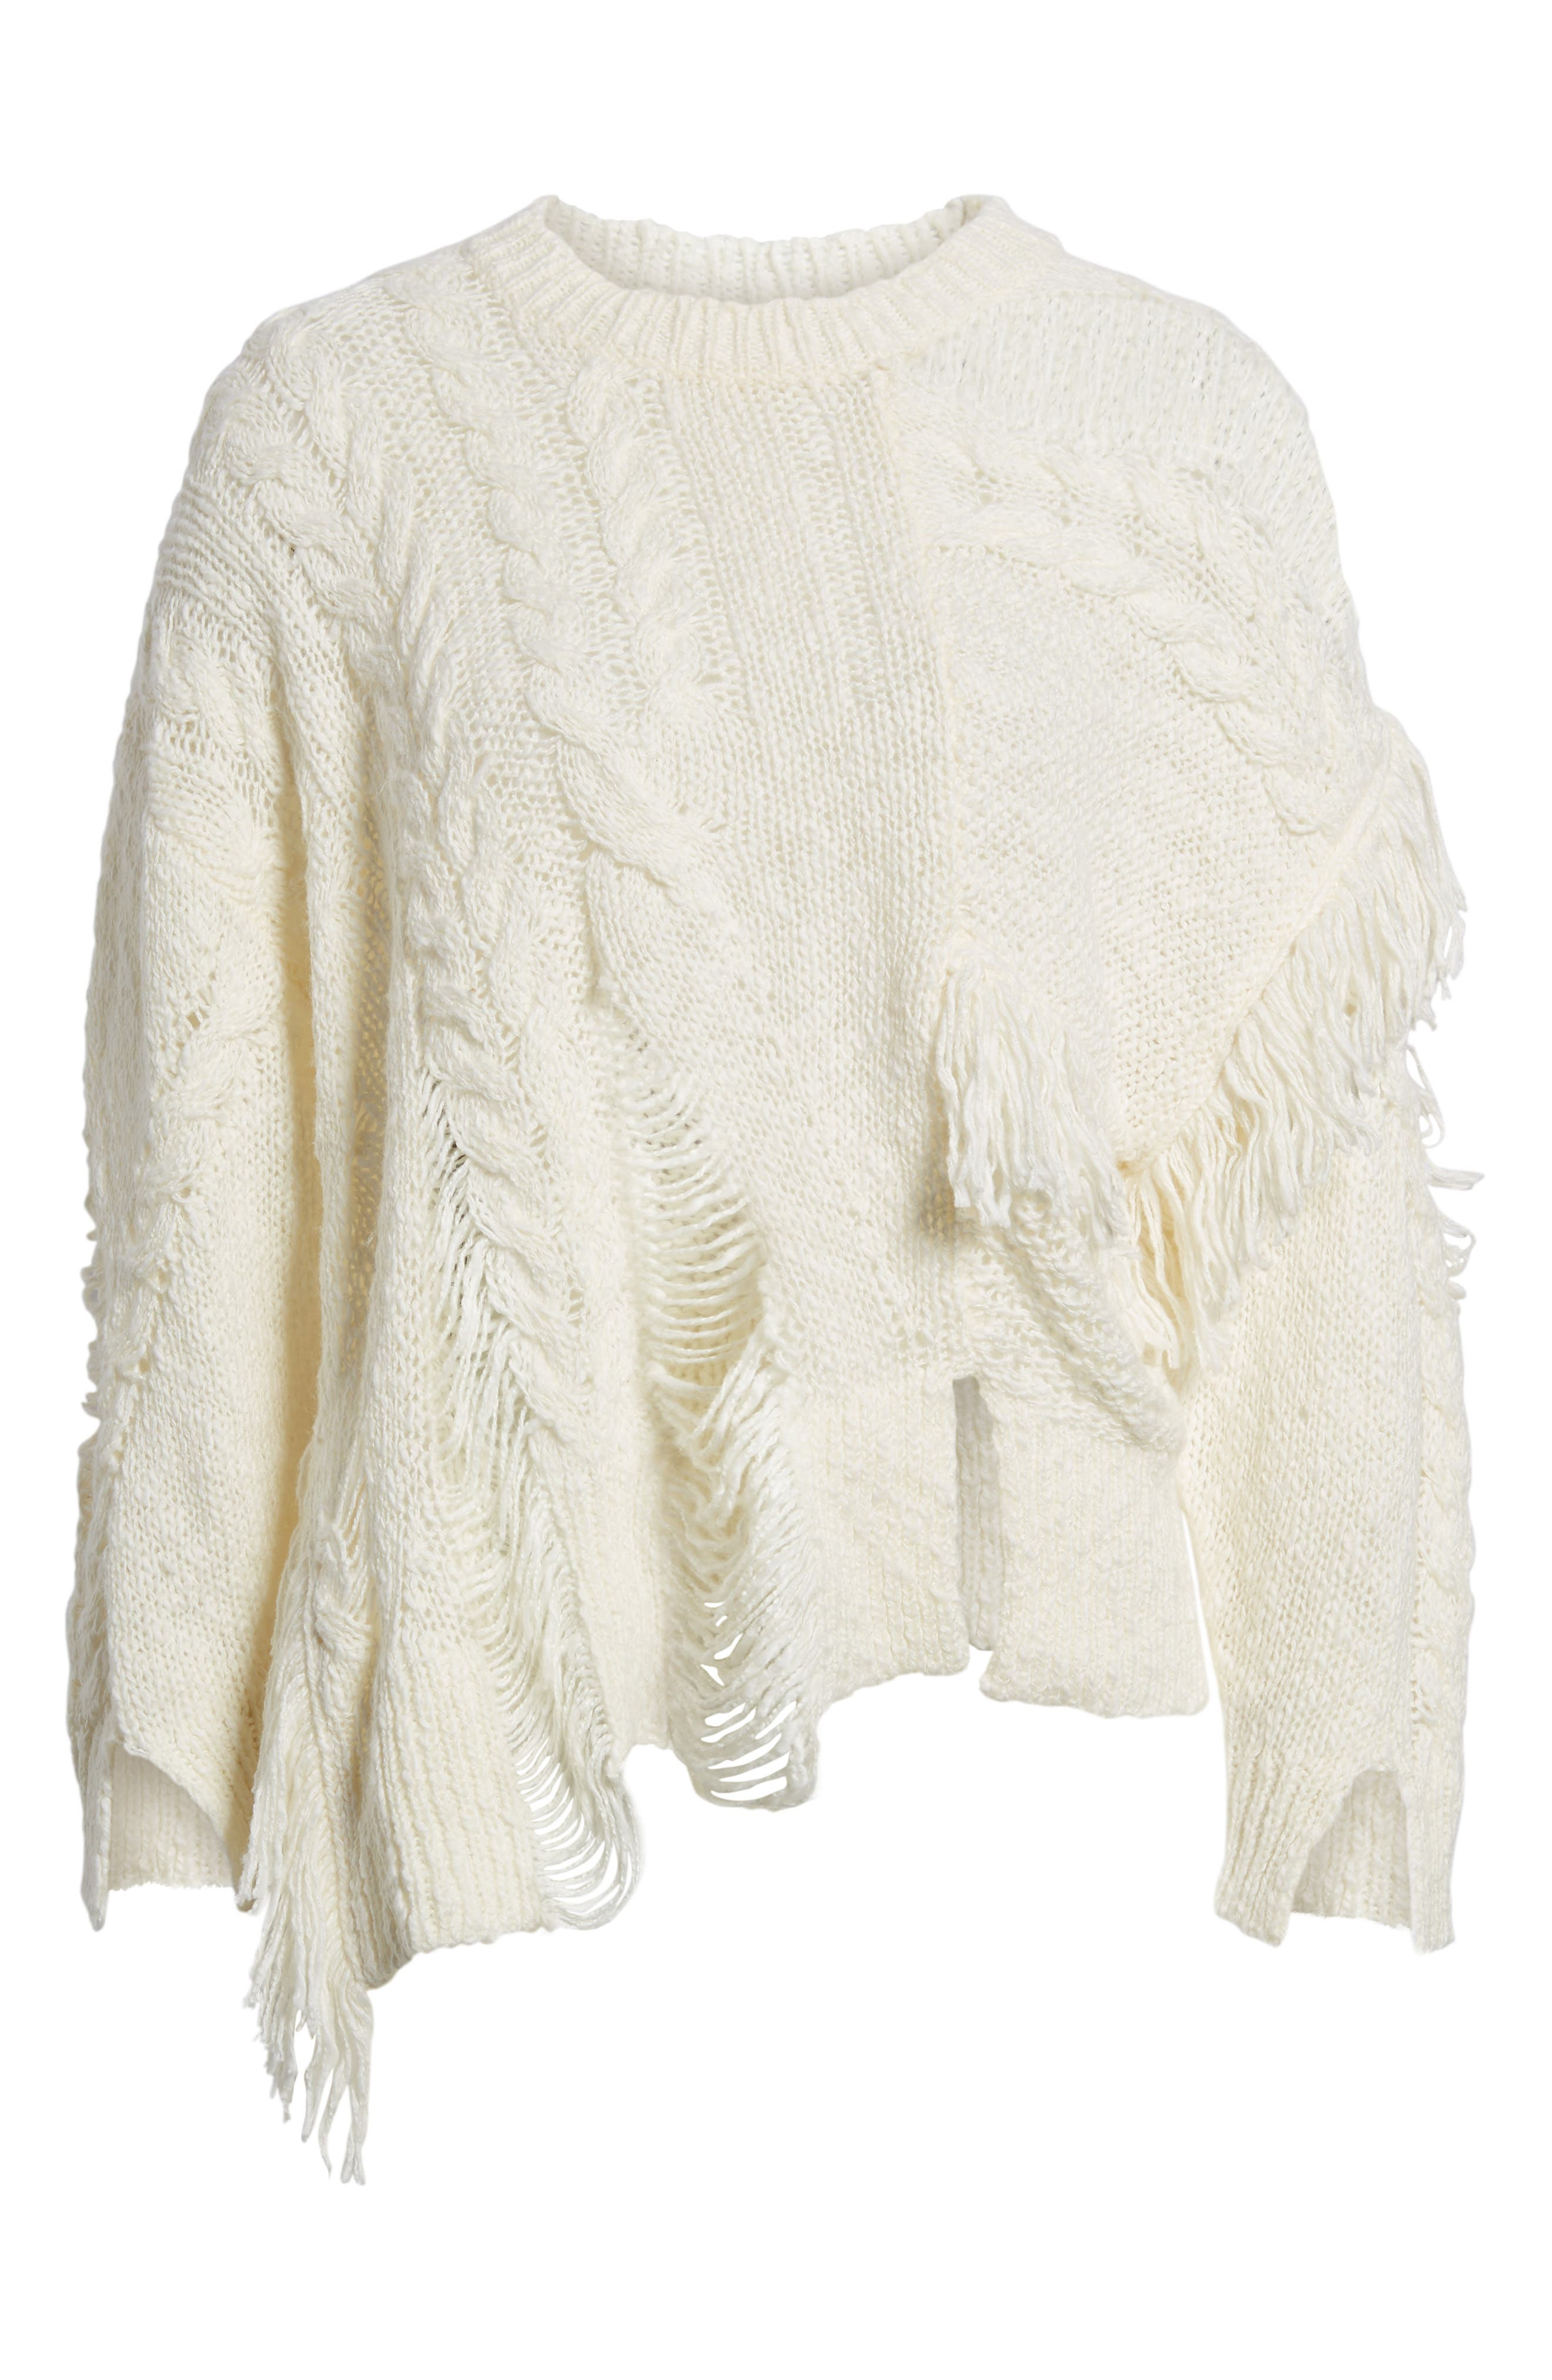 Mix Stitch Sweater,                             Alternate thumbnail 6, color,                             Ivory Egret